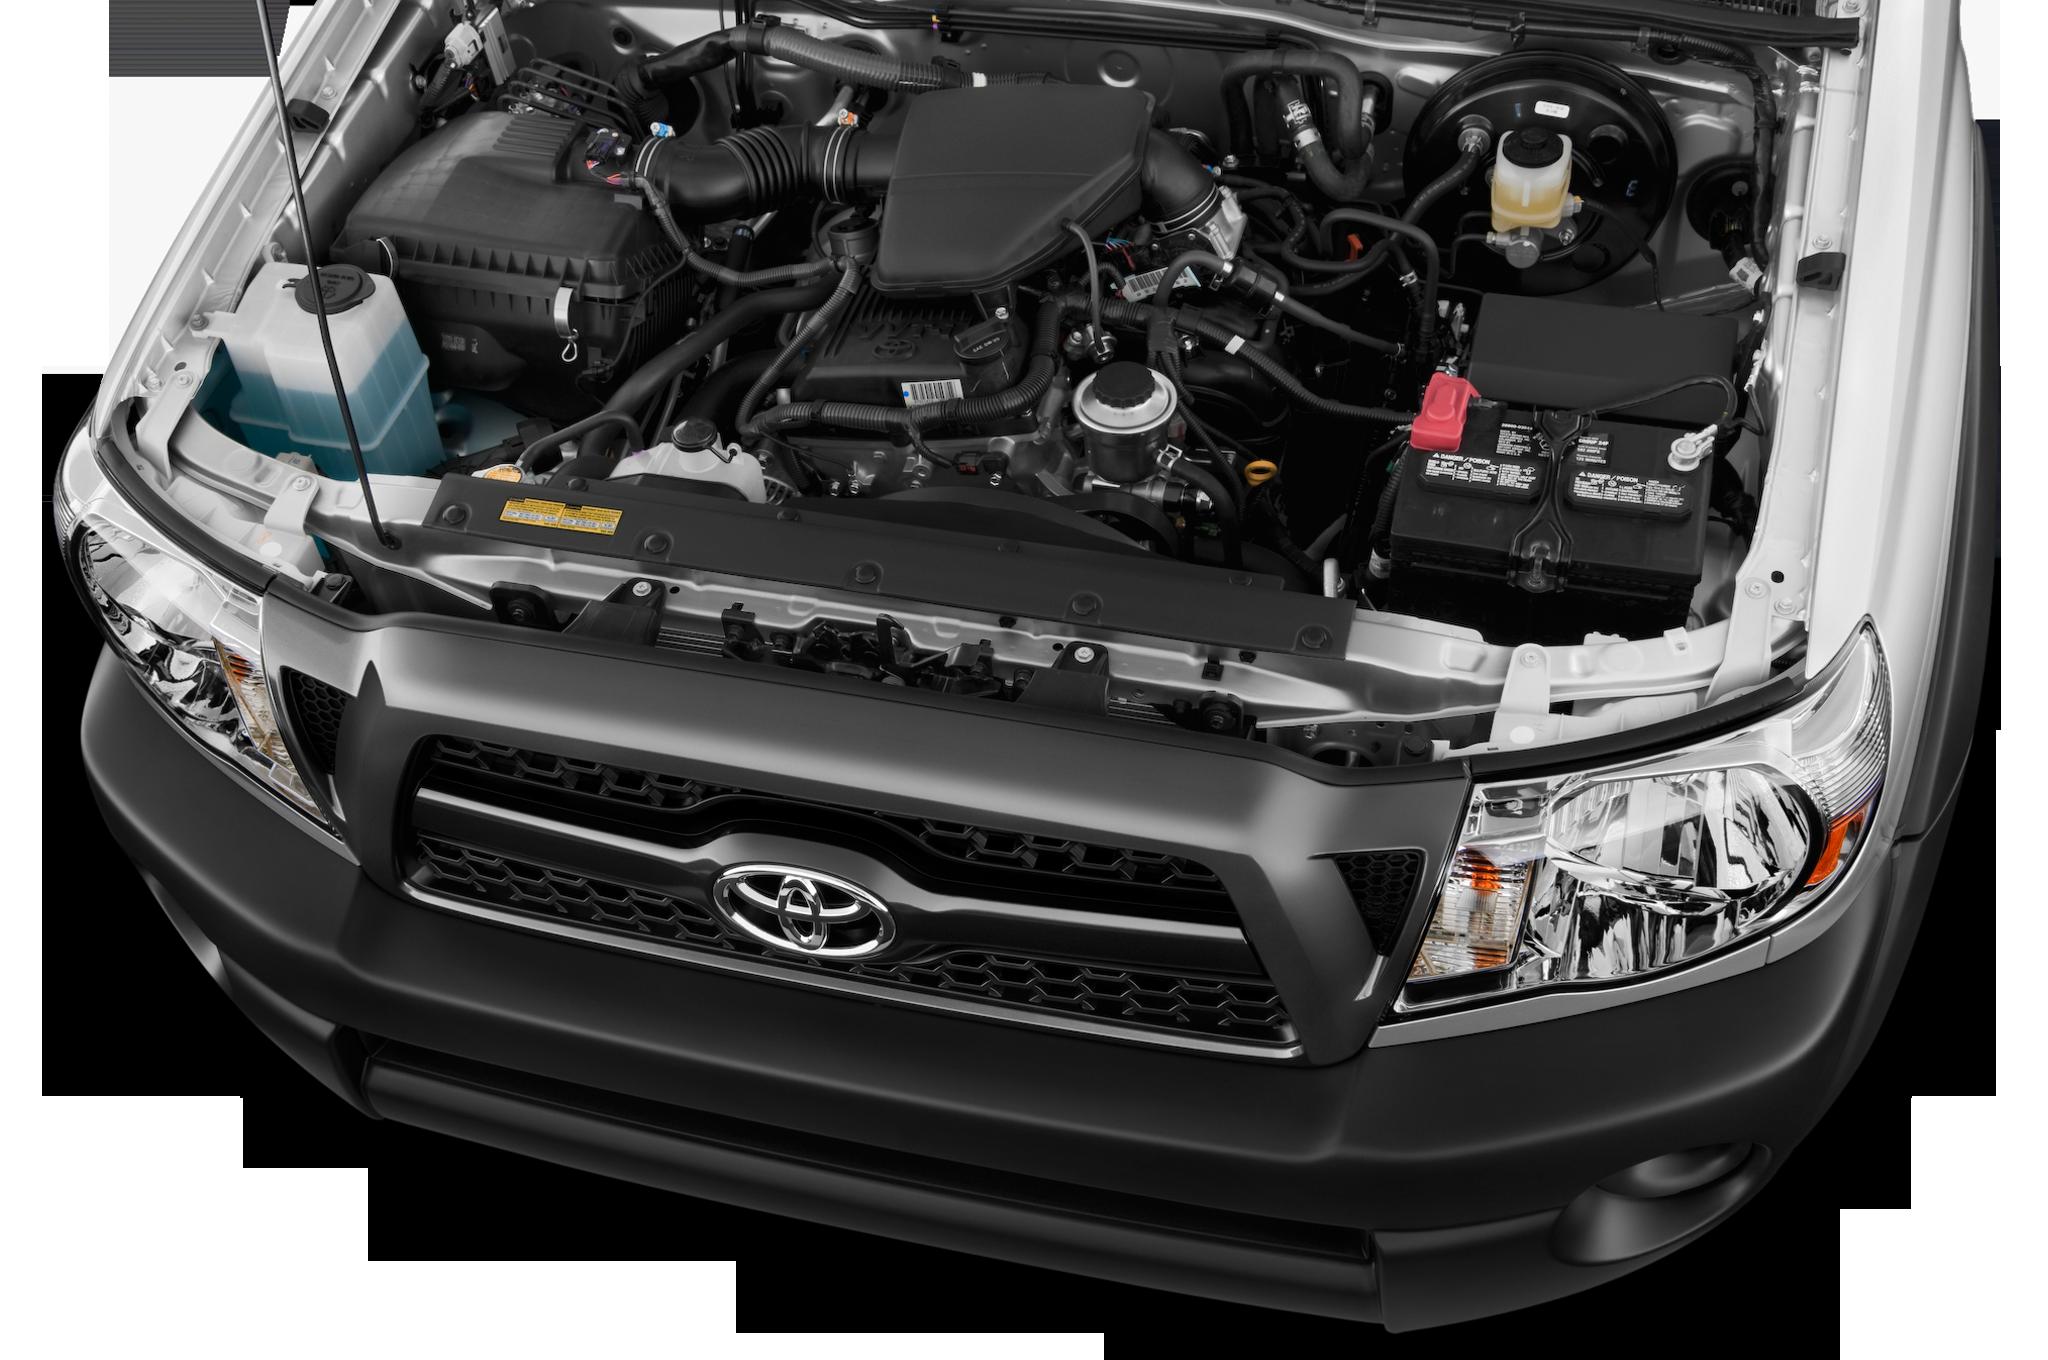 2012 Toyota Tacoma Pricing Begins At 17 685